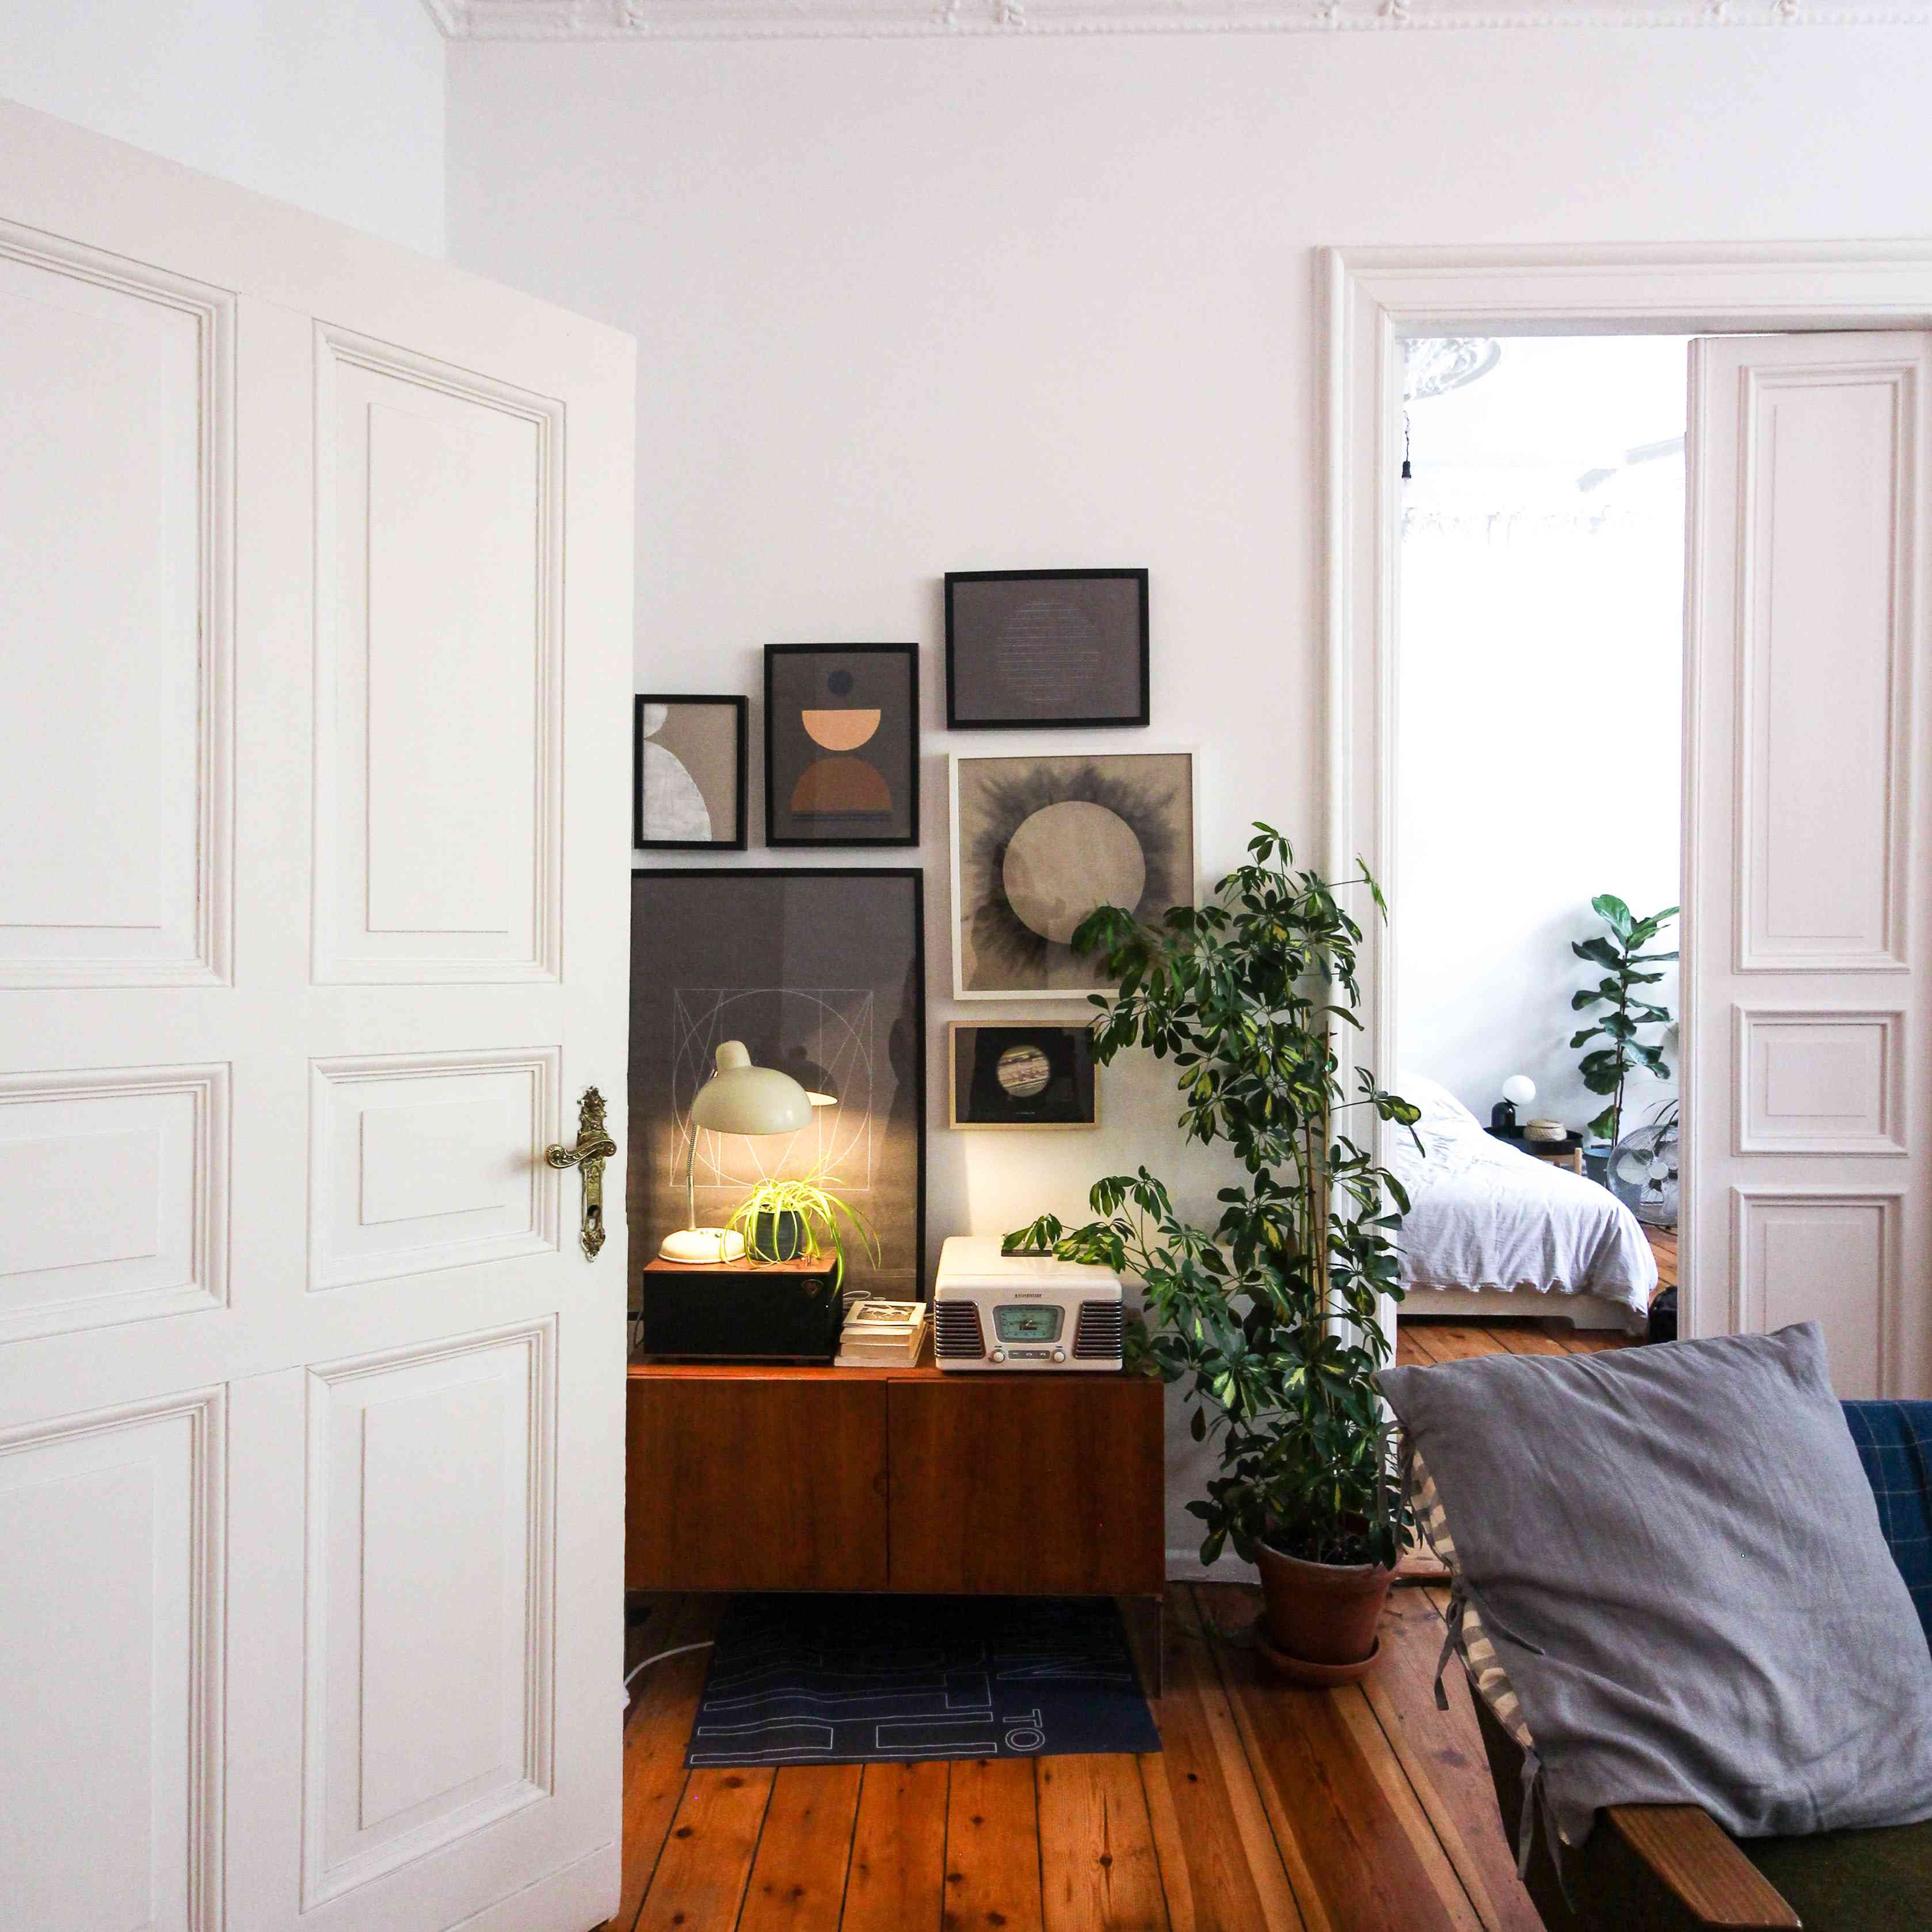 living room with artwork and wood floors facing a bedroom door